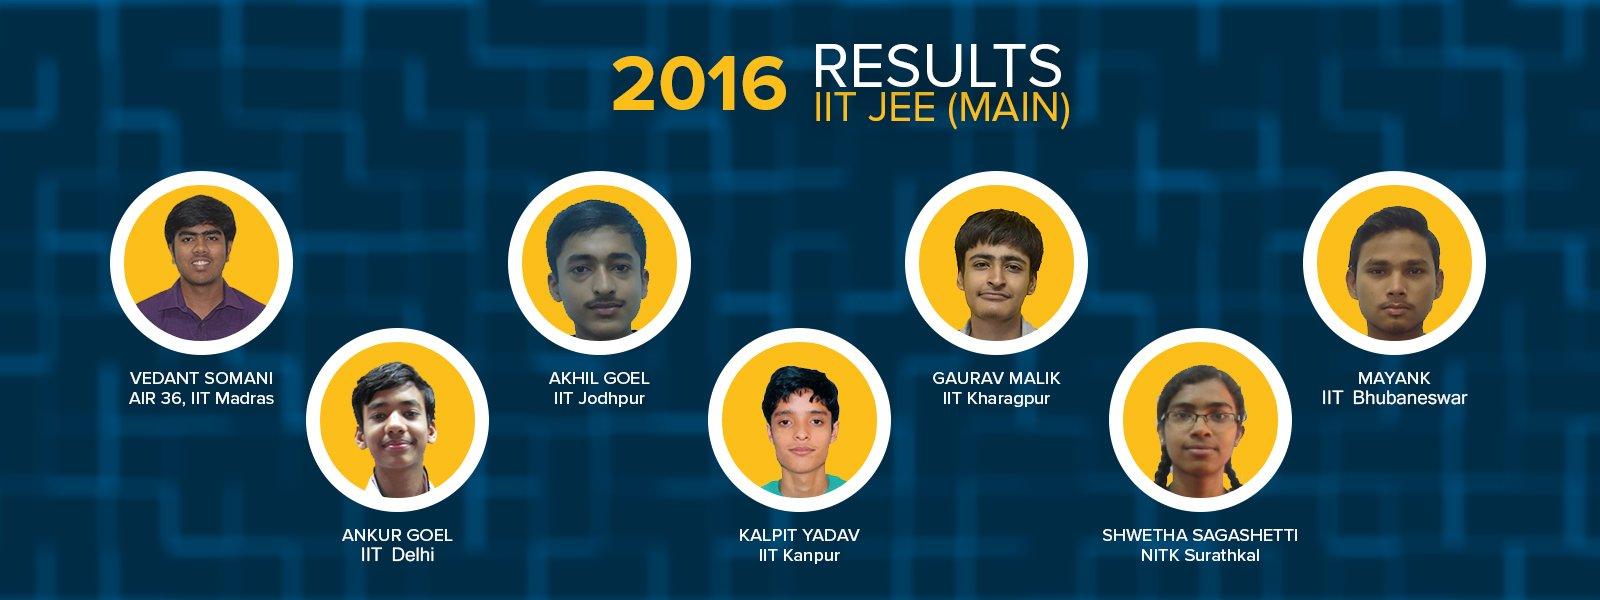 Avanti 2016 results